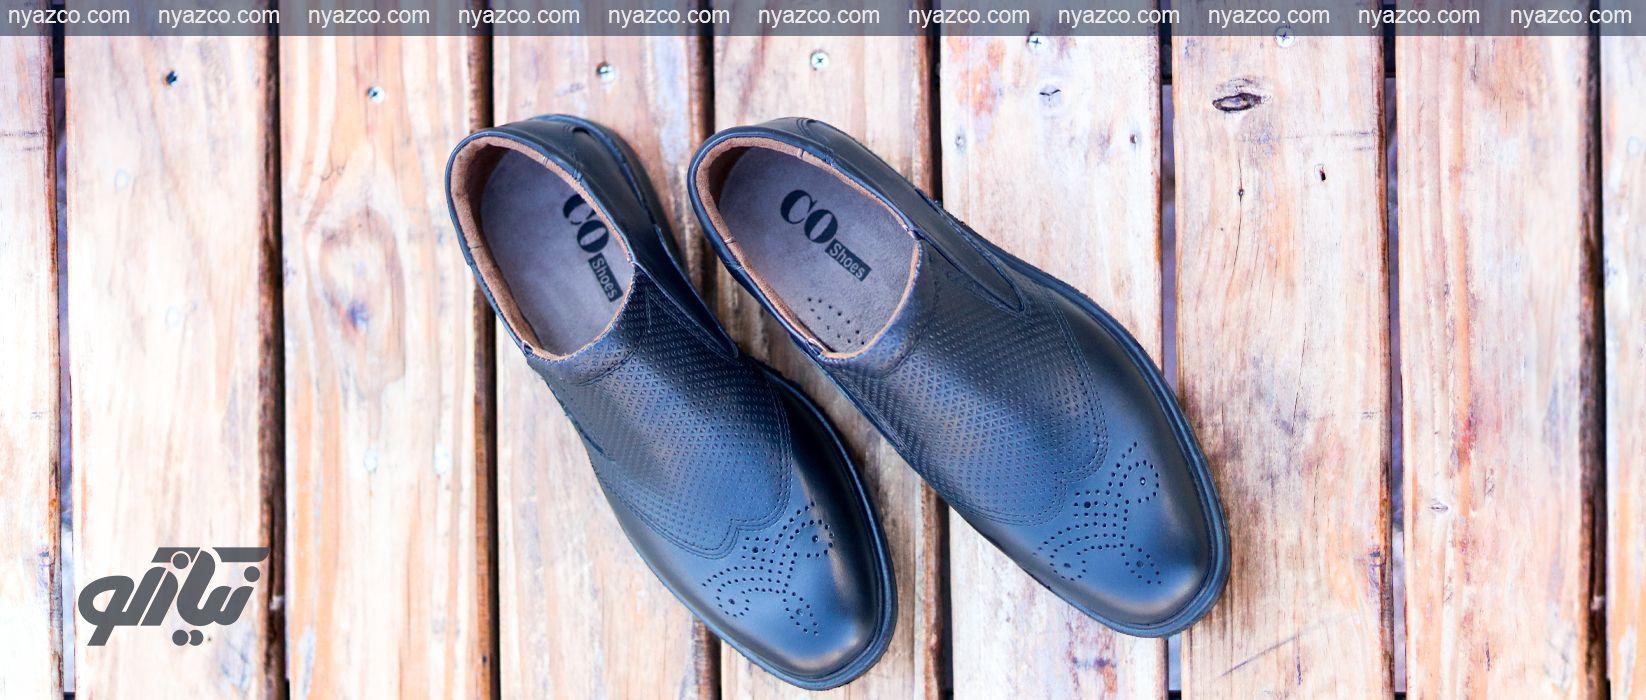 کفش رسمی مردانه کو تبریز